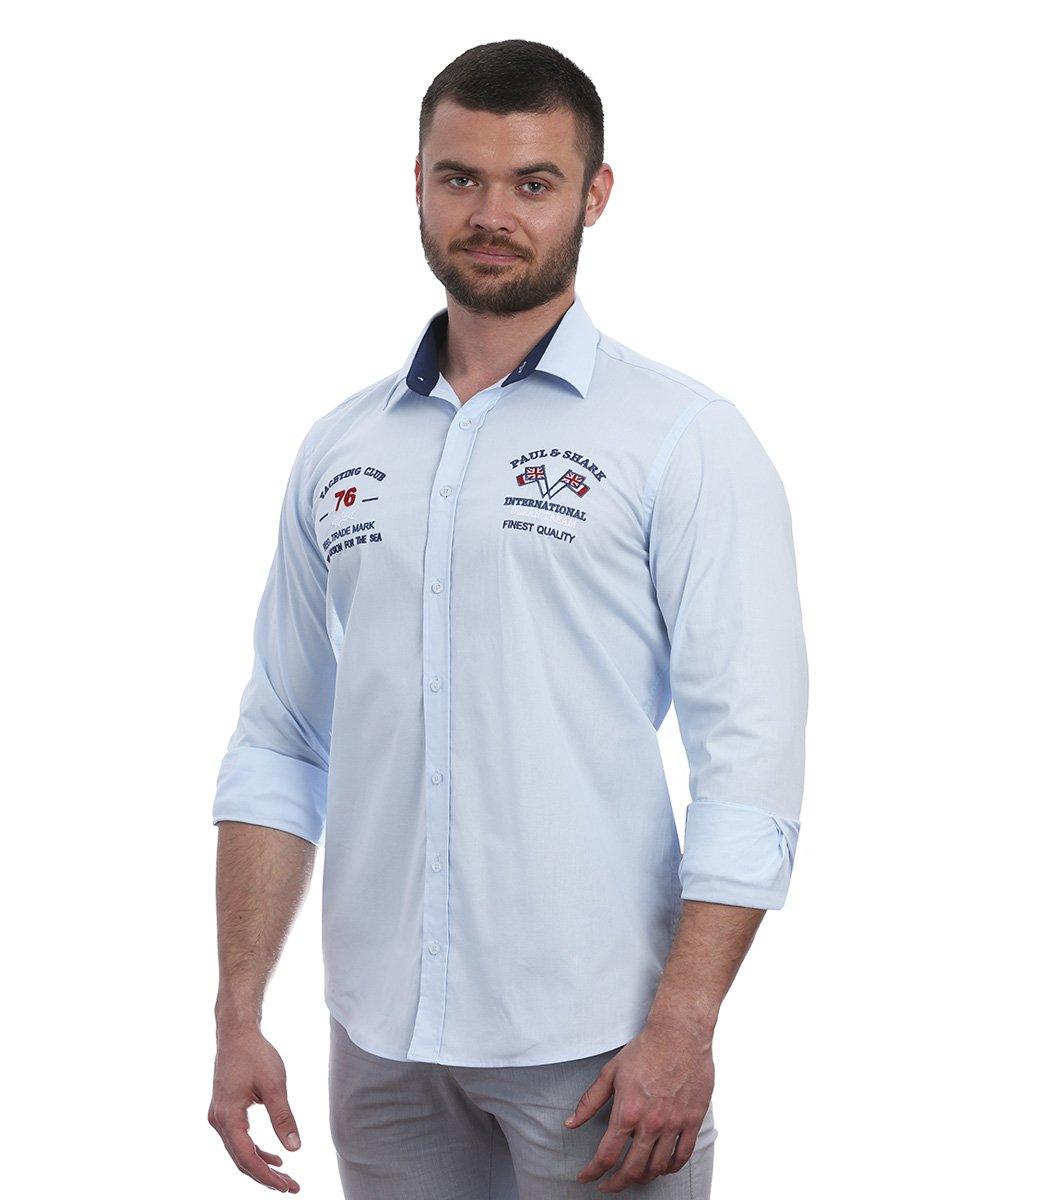 Голубая рубашка Paul&Shark 76 RP1 - Голубой - Вид 3